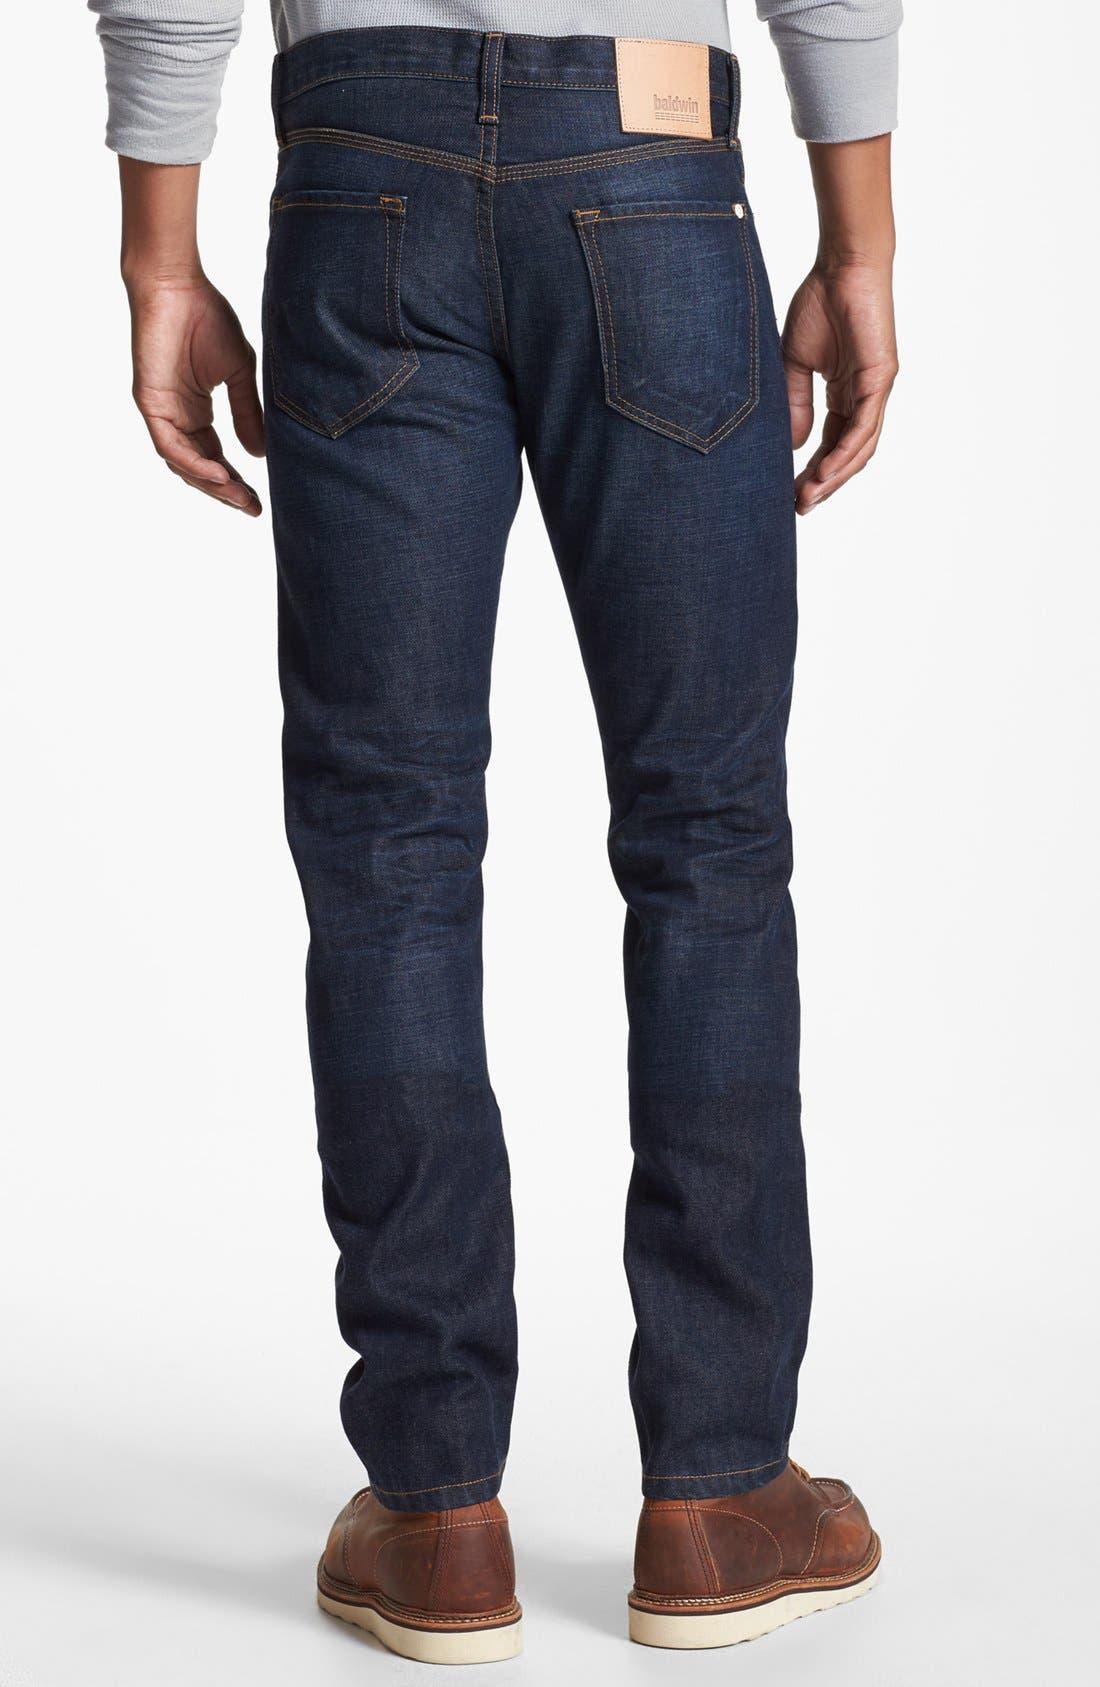 Alternate Image 1 Selected - Baldwin 'Henley' Skinny Fit Jeans (Daniel)